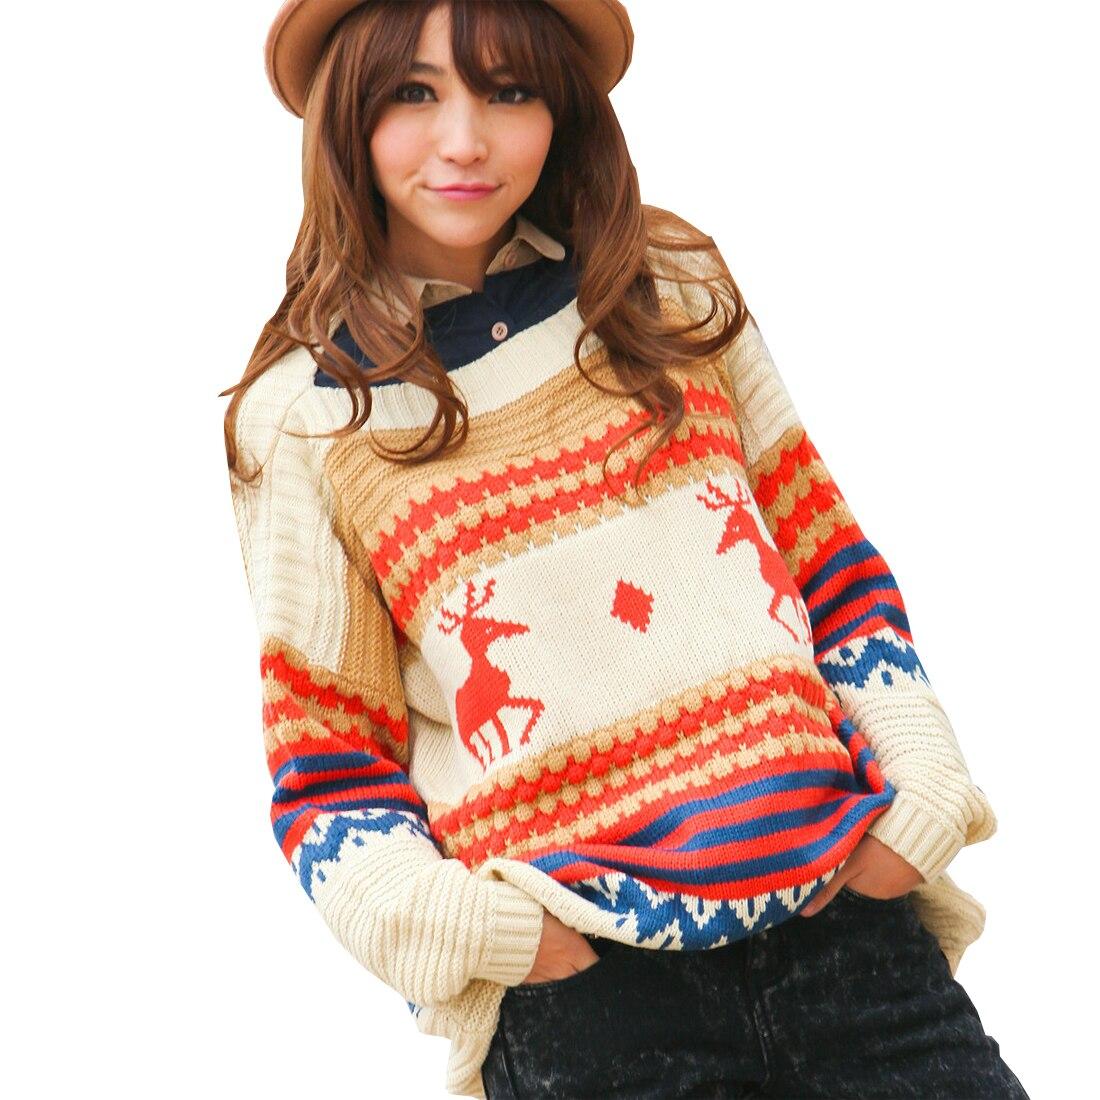 YJSFG HOUSE Women New Christmas Sweater Thick Deer Long Sleeve Loose Knit Sweater Jumper Knitwear Outwear Pullover Winter Warm